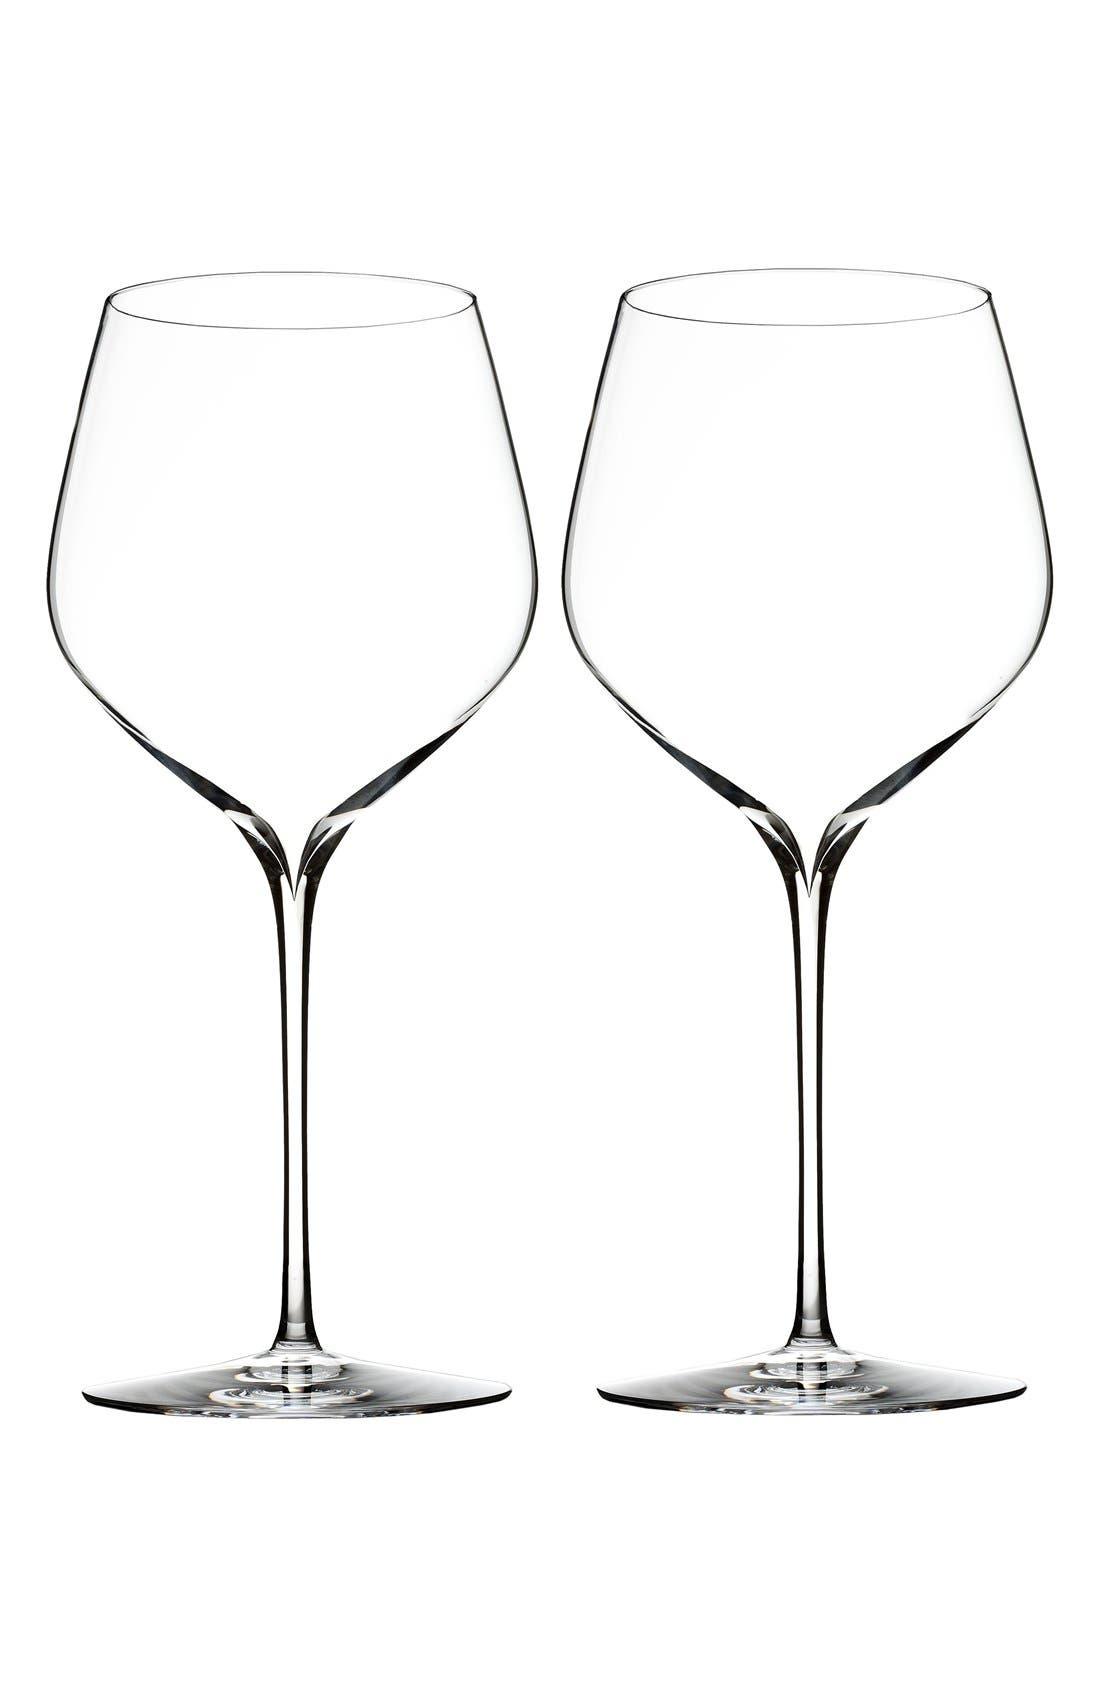 'Elegance' Fine Crystal Cabernet Sauvignon Glasses,                             Main thumbnail 1, color,                             Clear